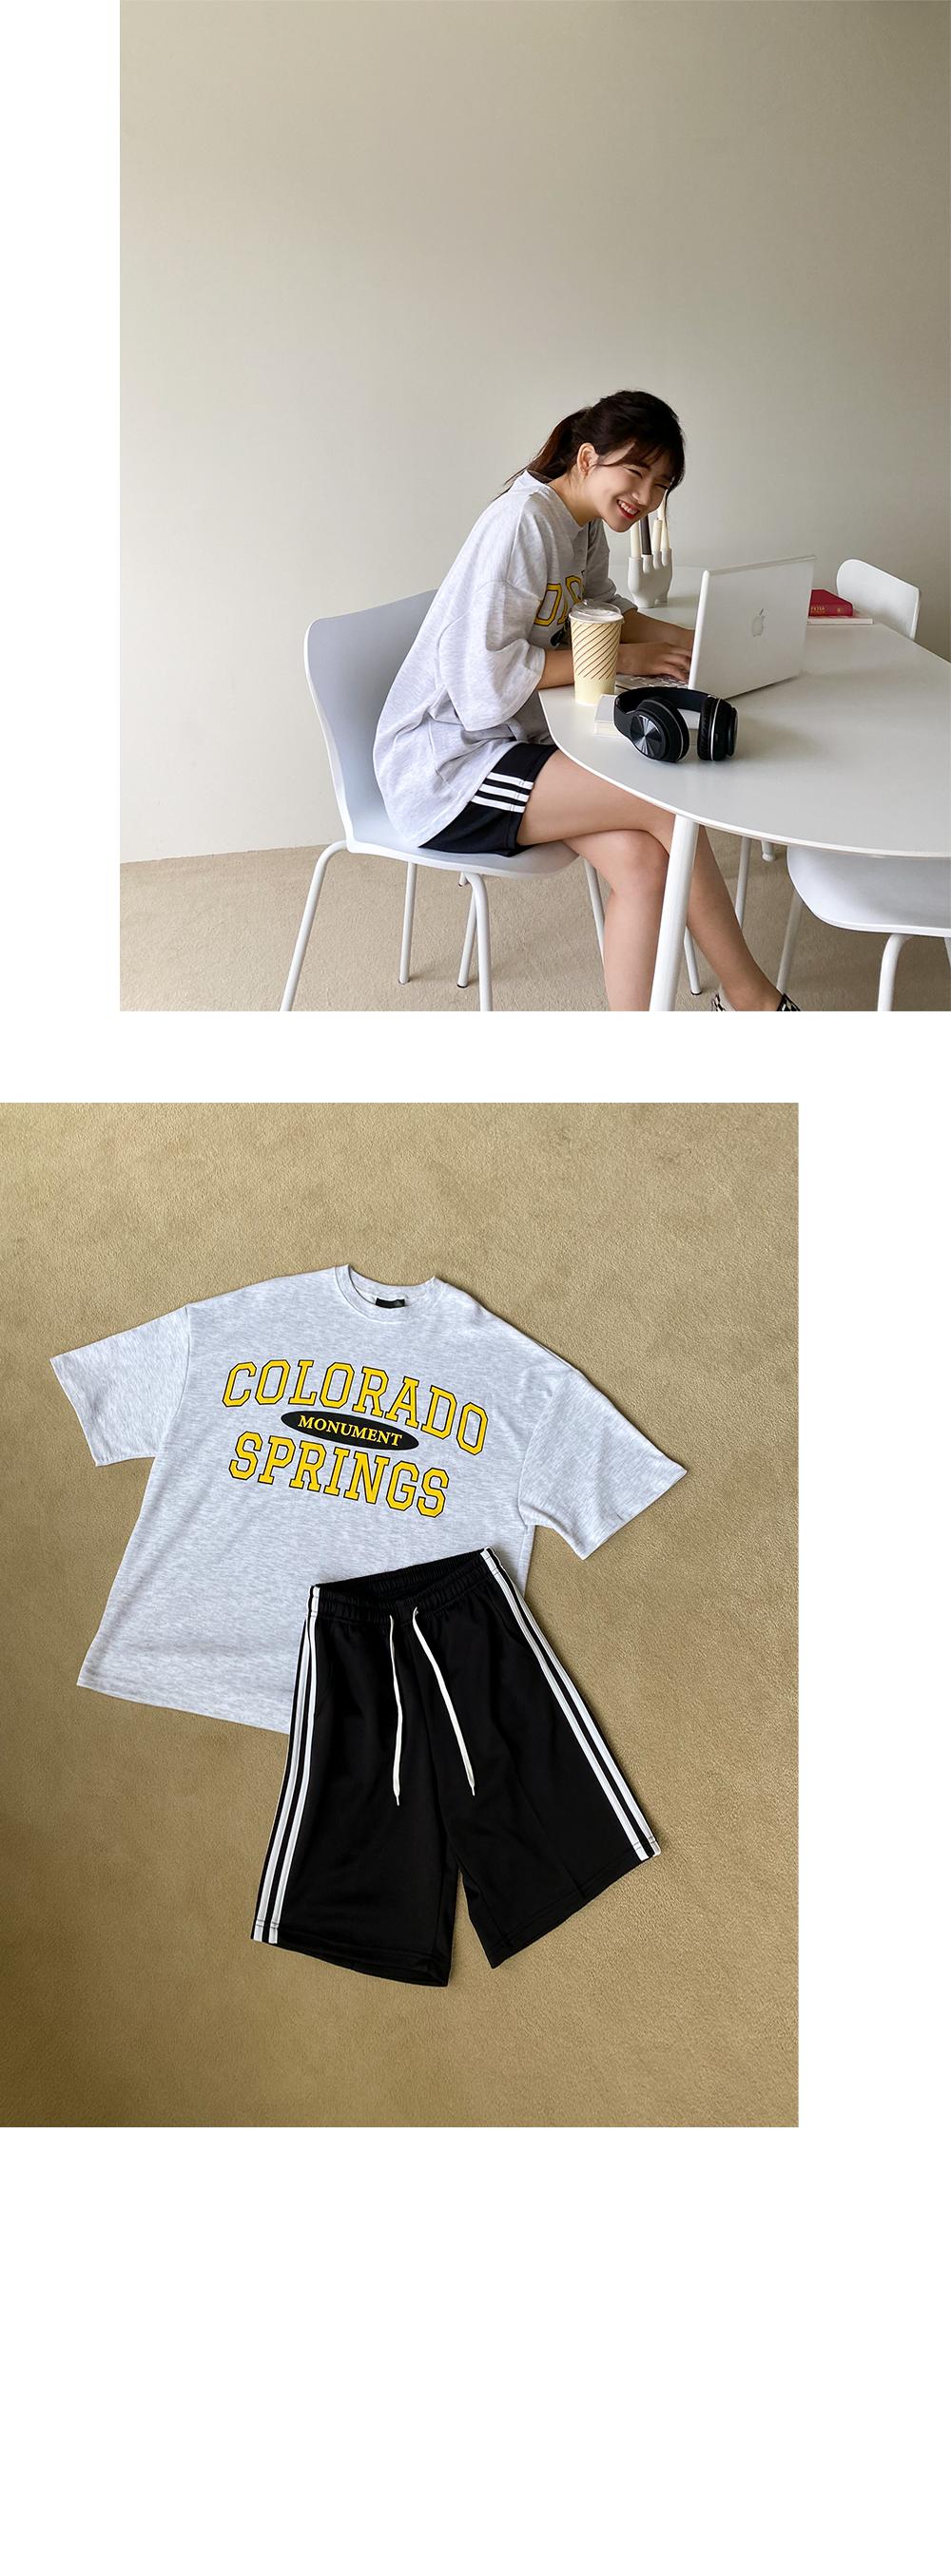 Big 55-120 Springs Overfit Cotton T-shirt